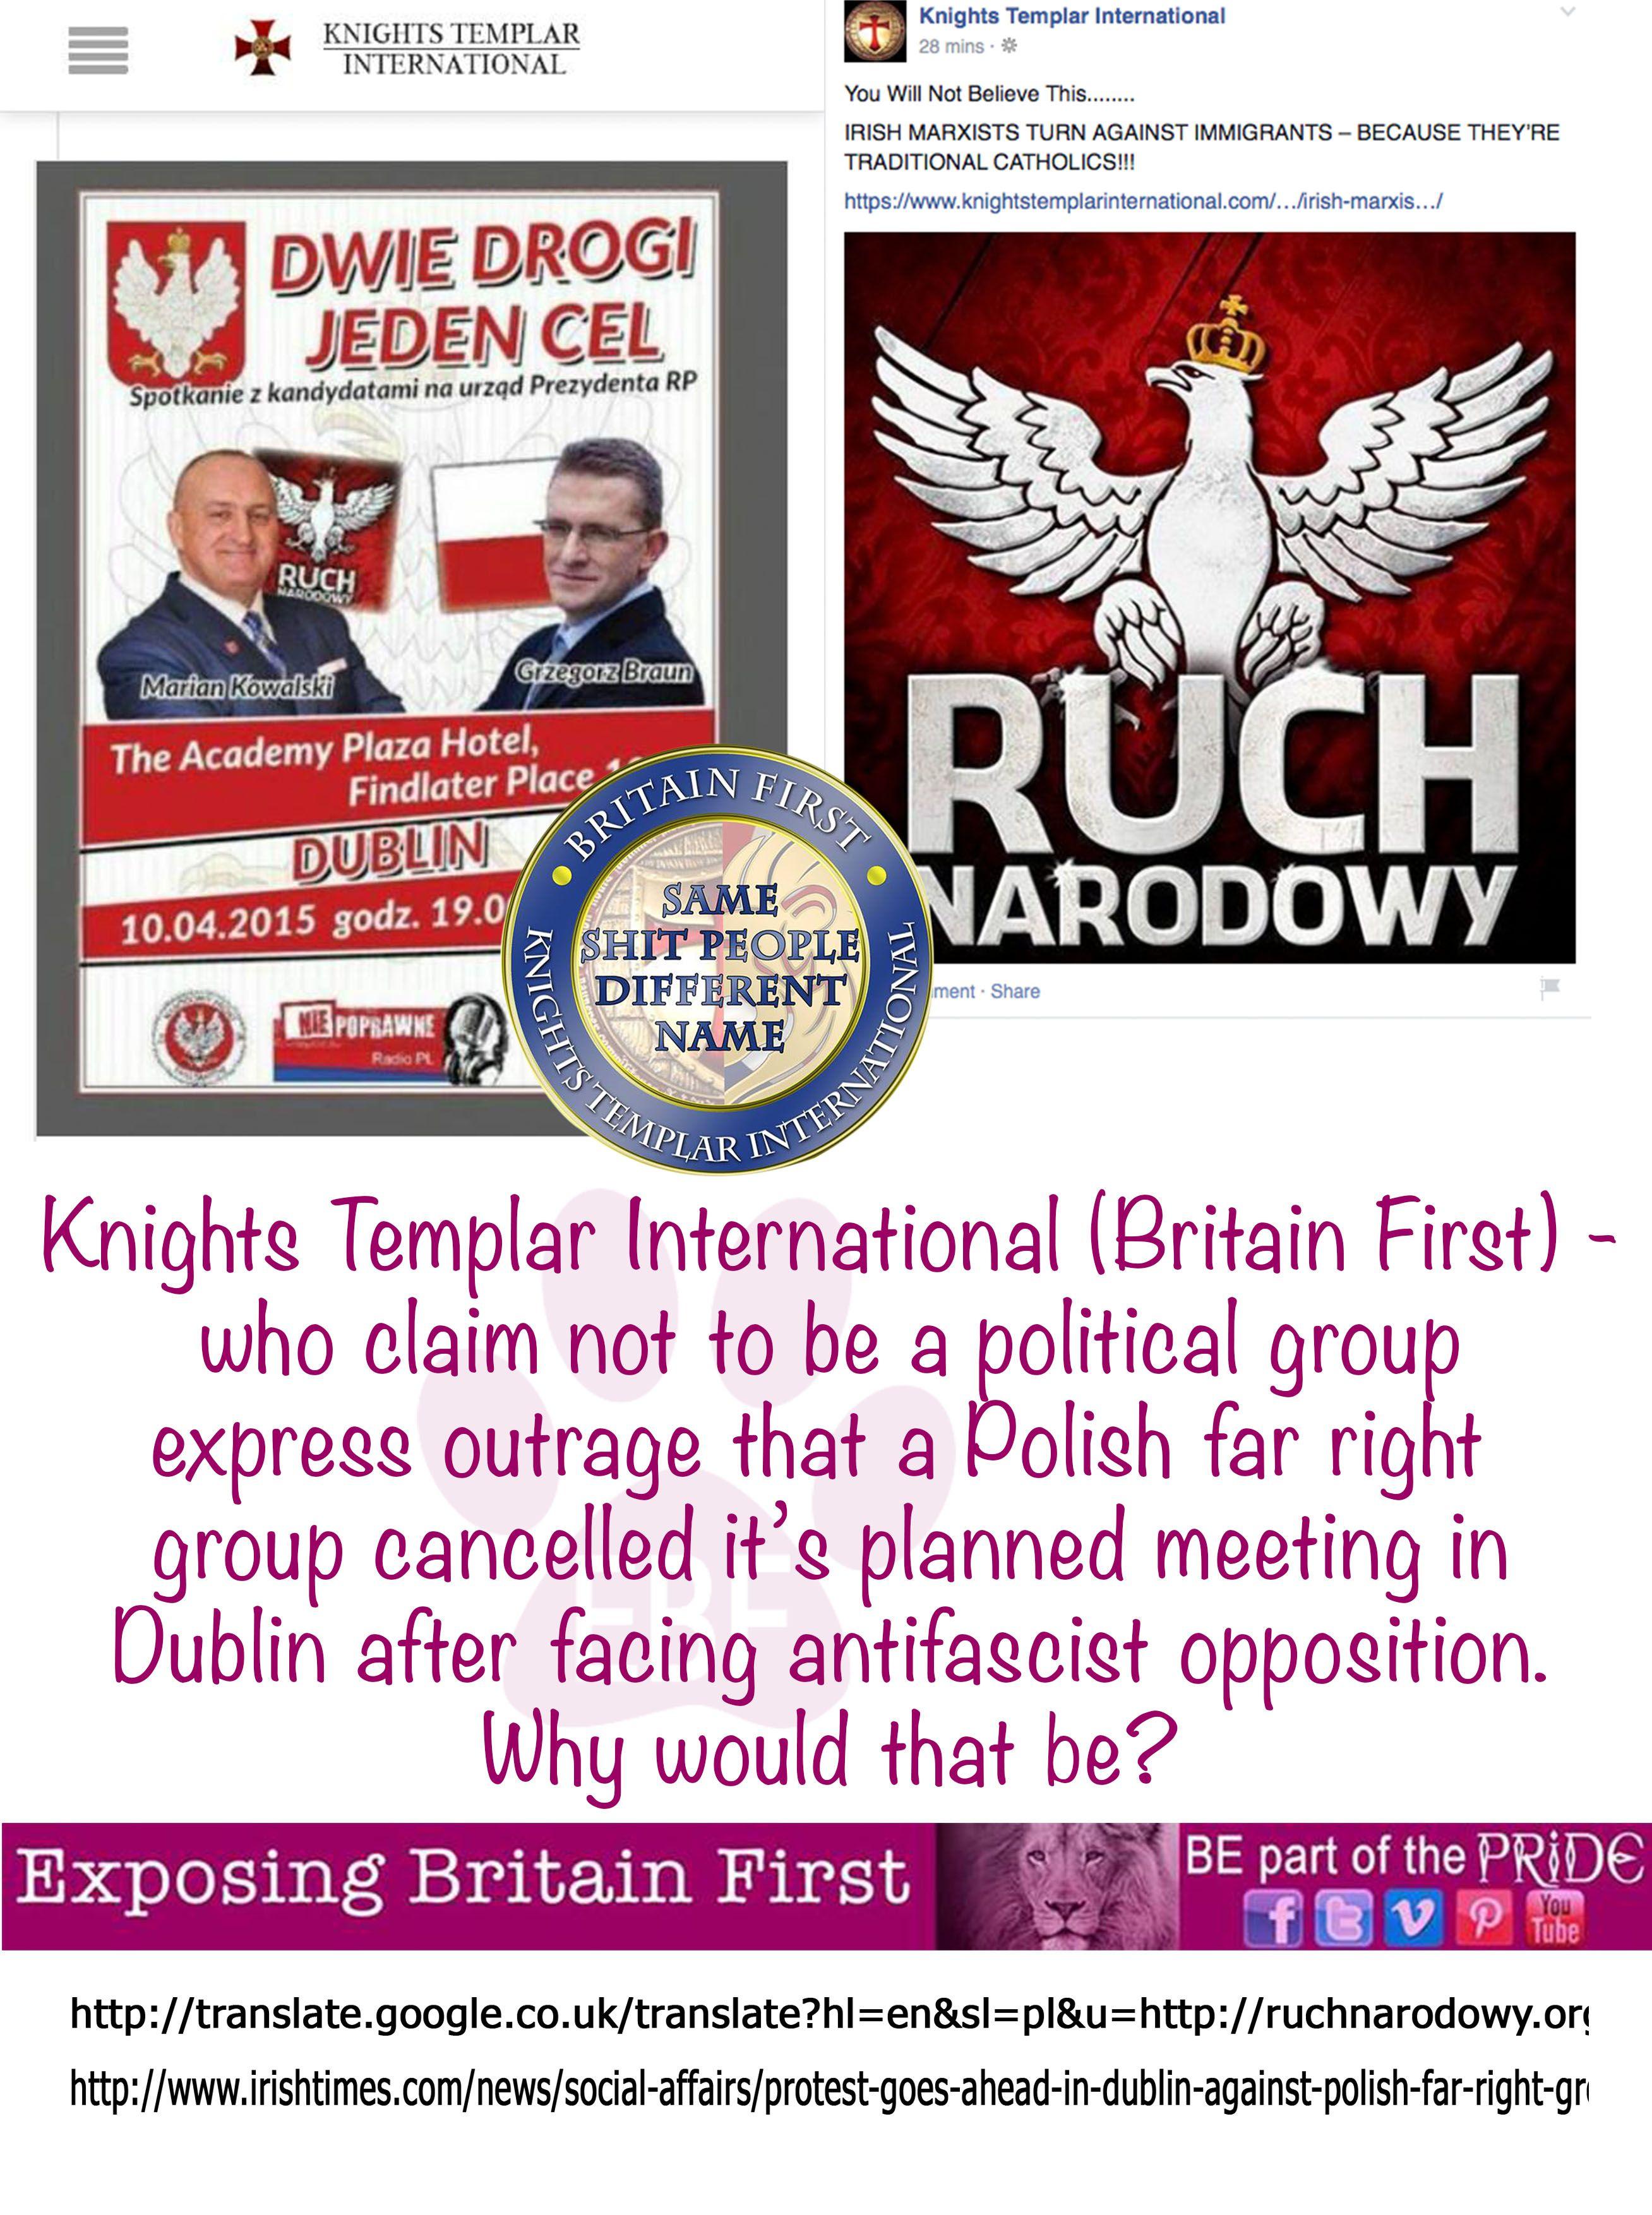 knights templar international aka britain first supporting polish